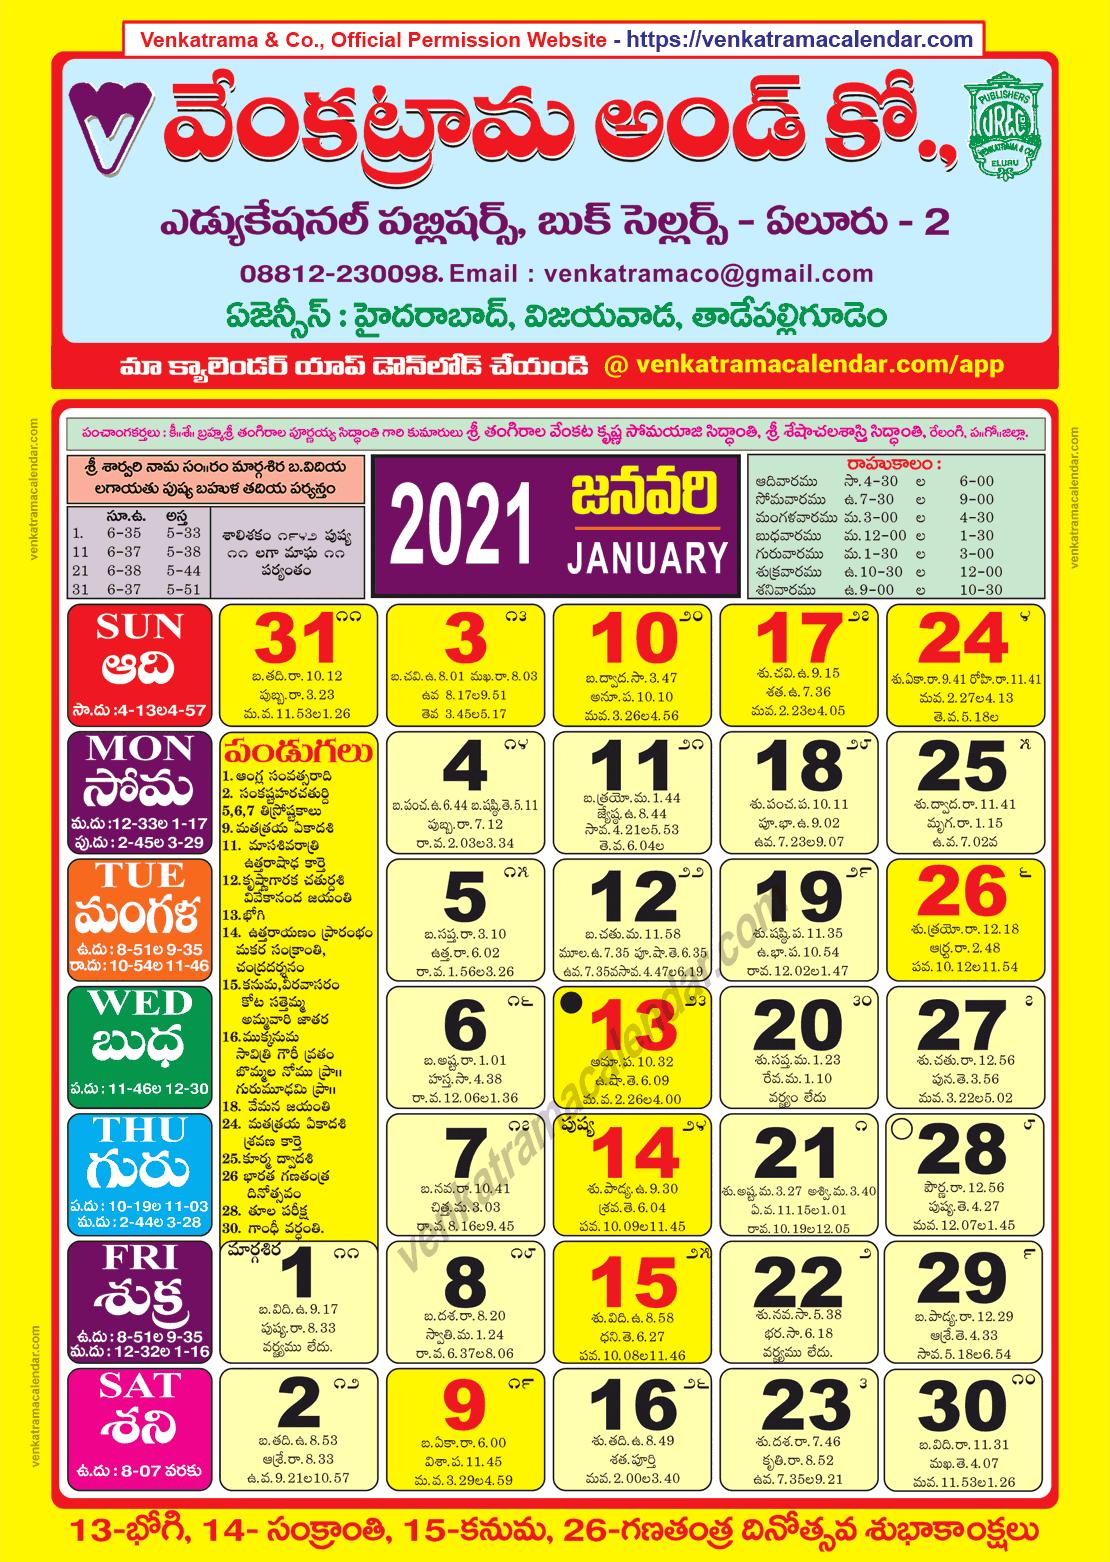 Venkatrama Co 2021 January Telugu Calendar Colour throughout 2022 Sunrise And Sunset Calendar